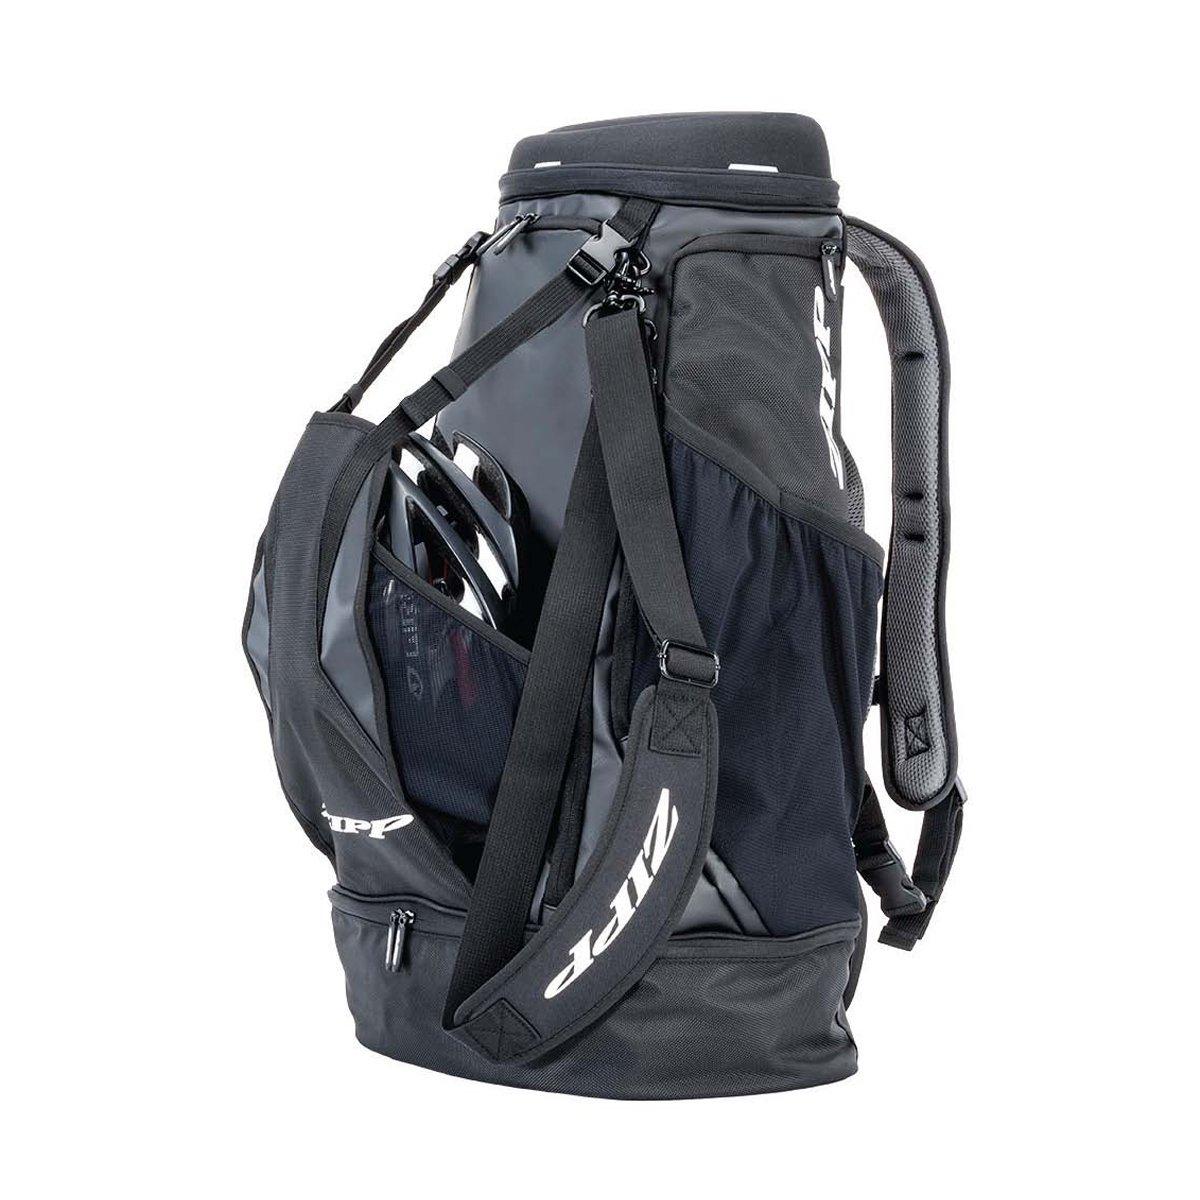 Zipp Transition 1 Gear Bag Black, 56 Liter